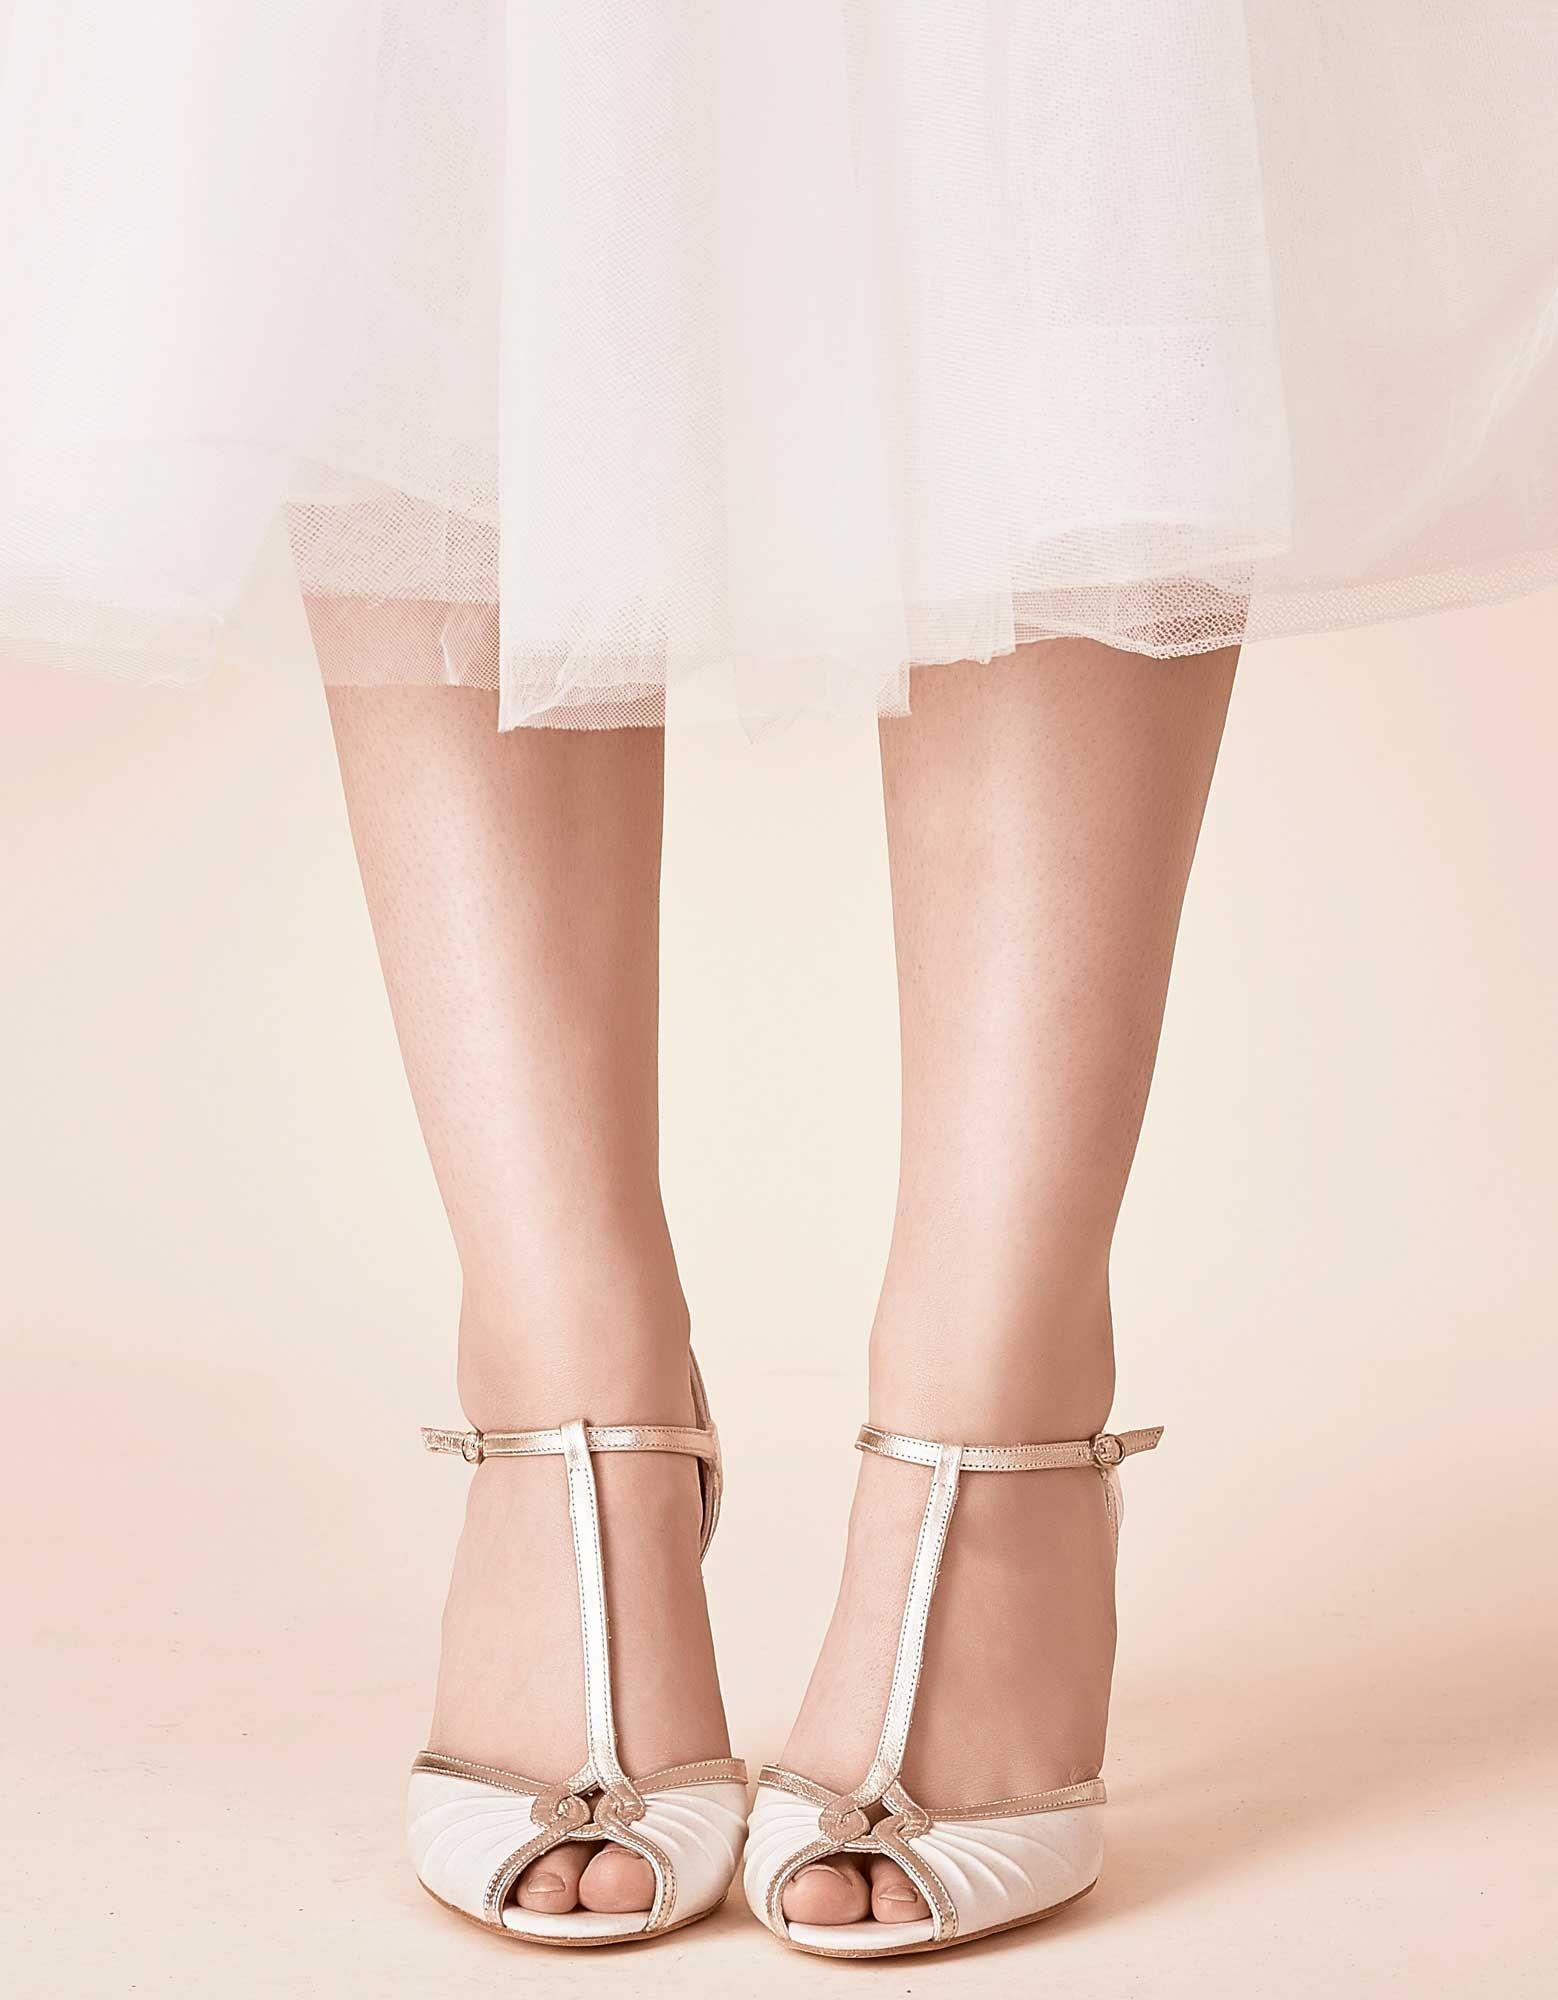 Mimi Vintage Style Dresses Wedding Shoes Rachel Simpson